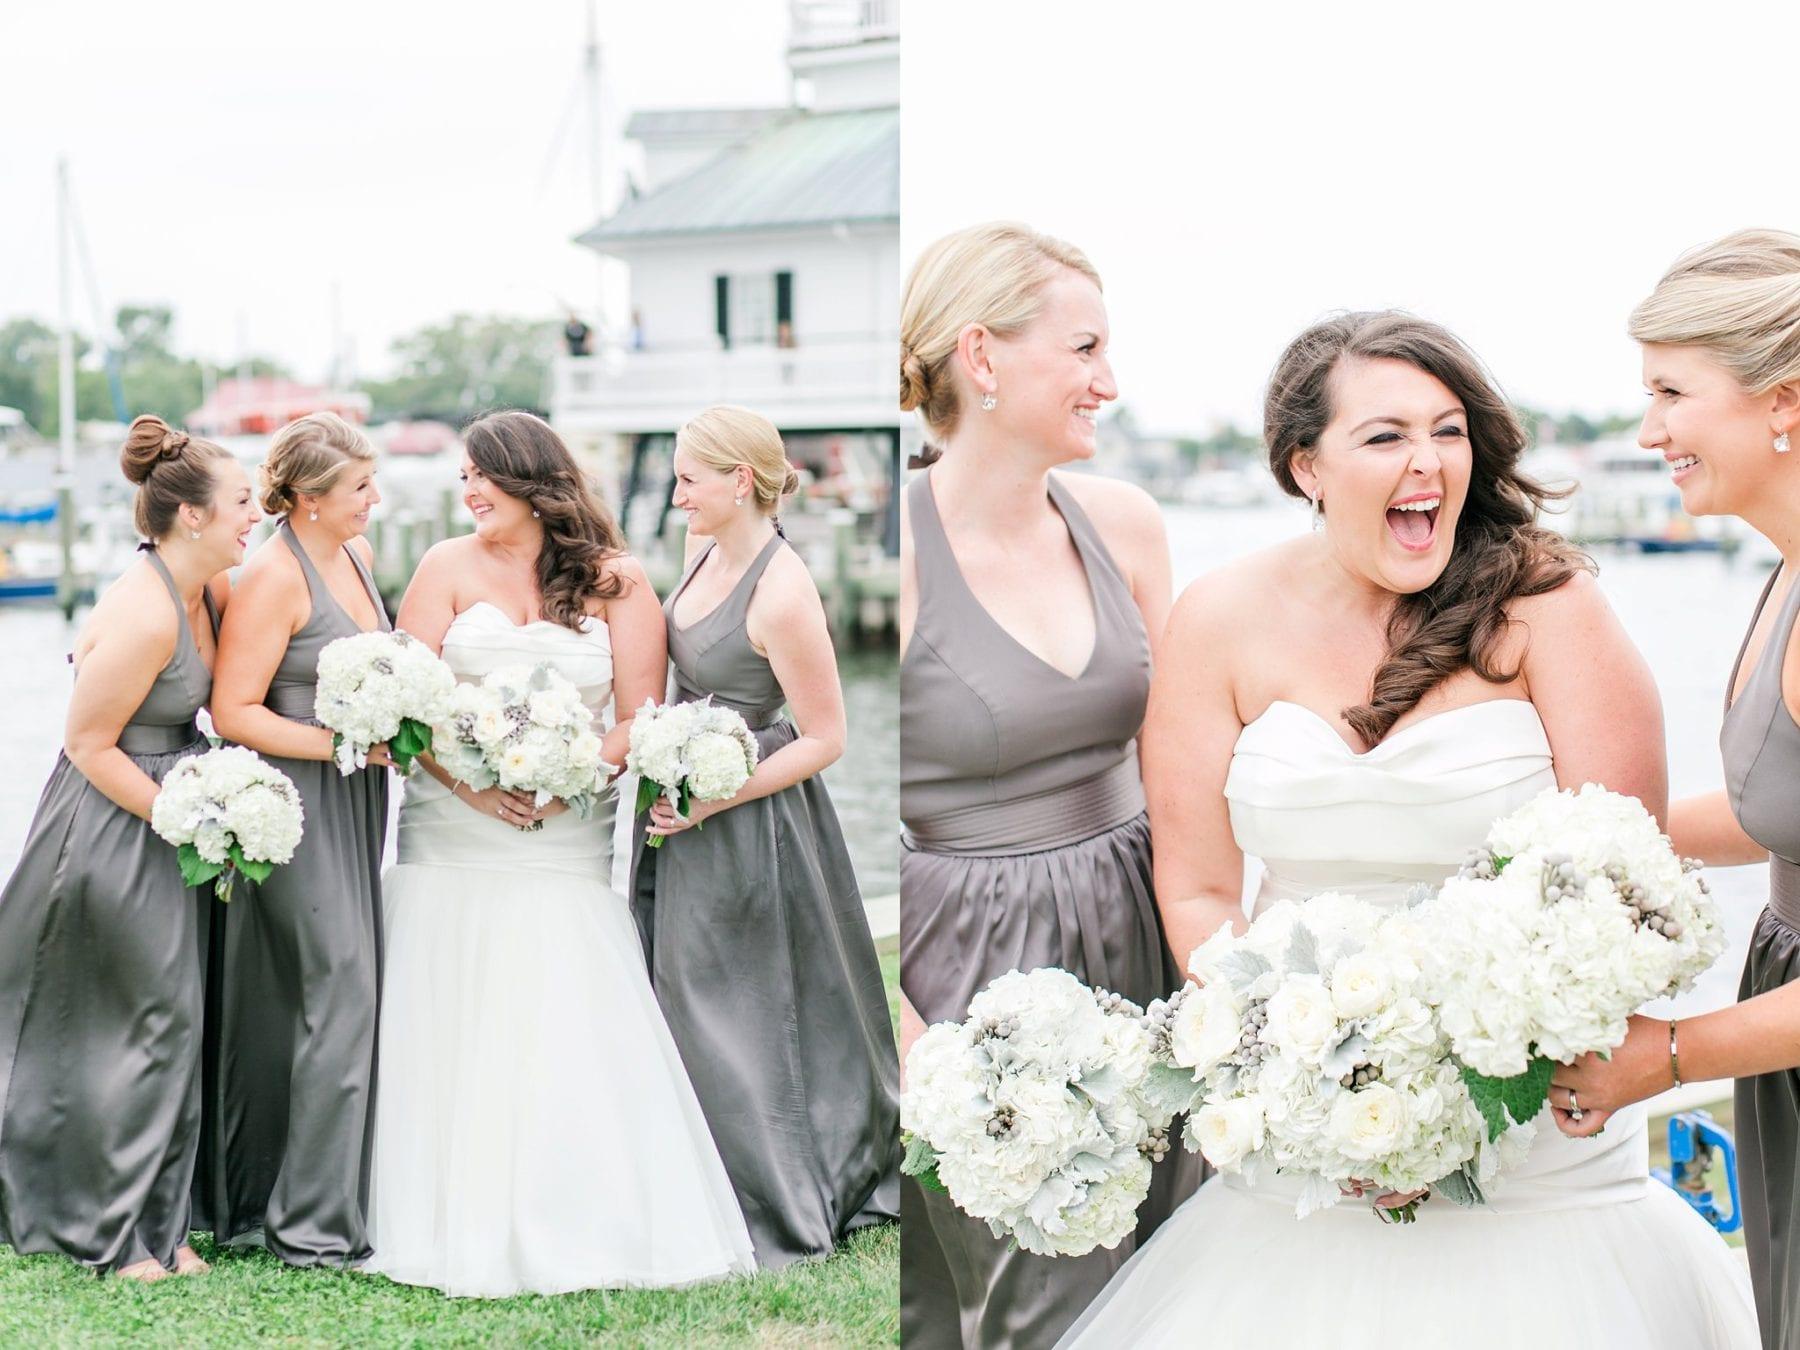 Chesapeake Bay Maritime Museum Wedding Photos Maryland Wedding Photographer Megan Kelsey Photography Halie & Mike-82.jpg